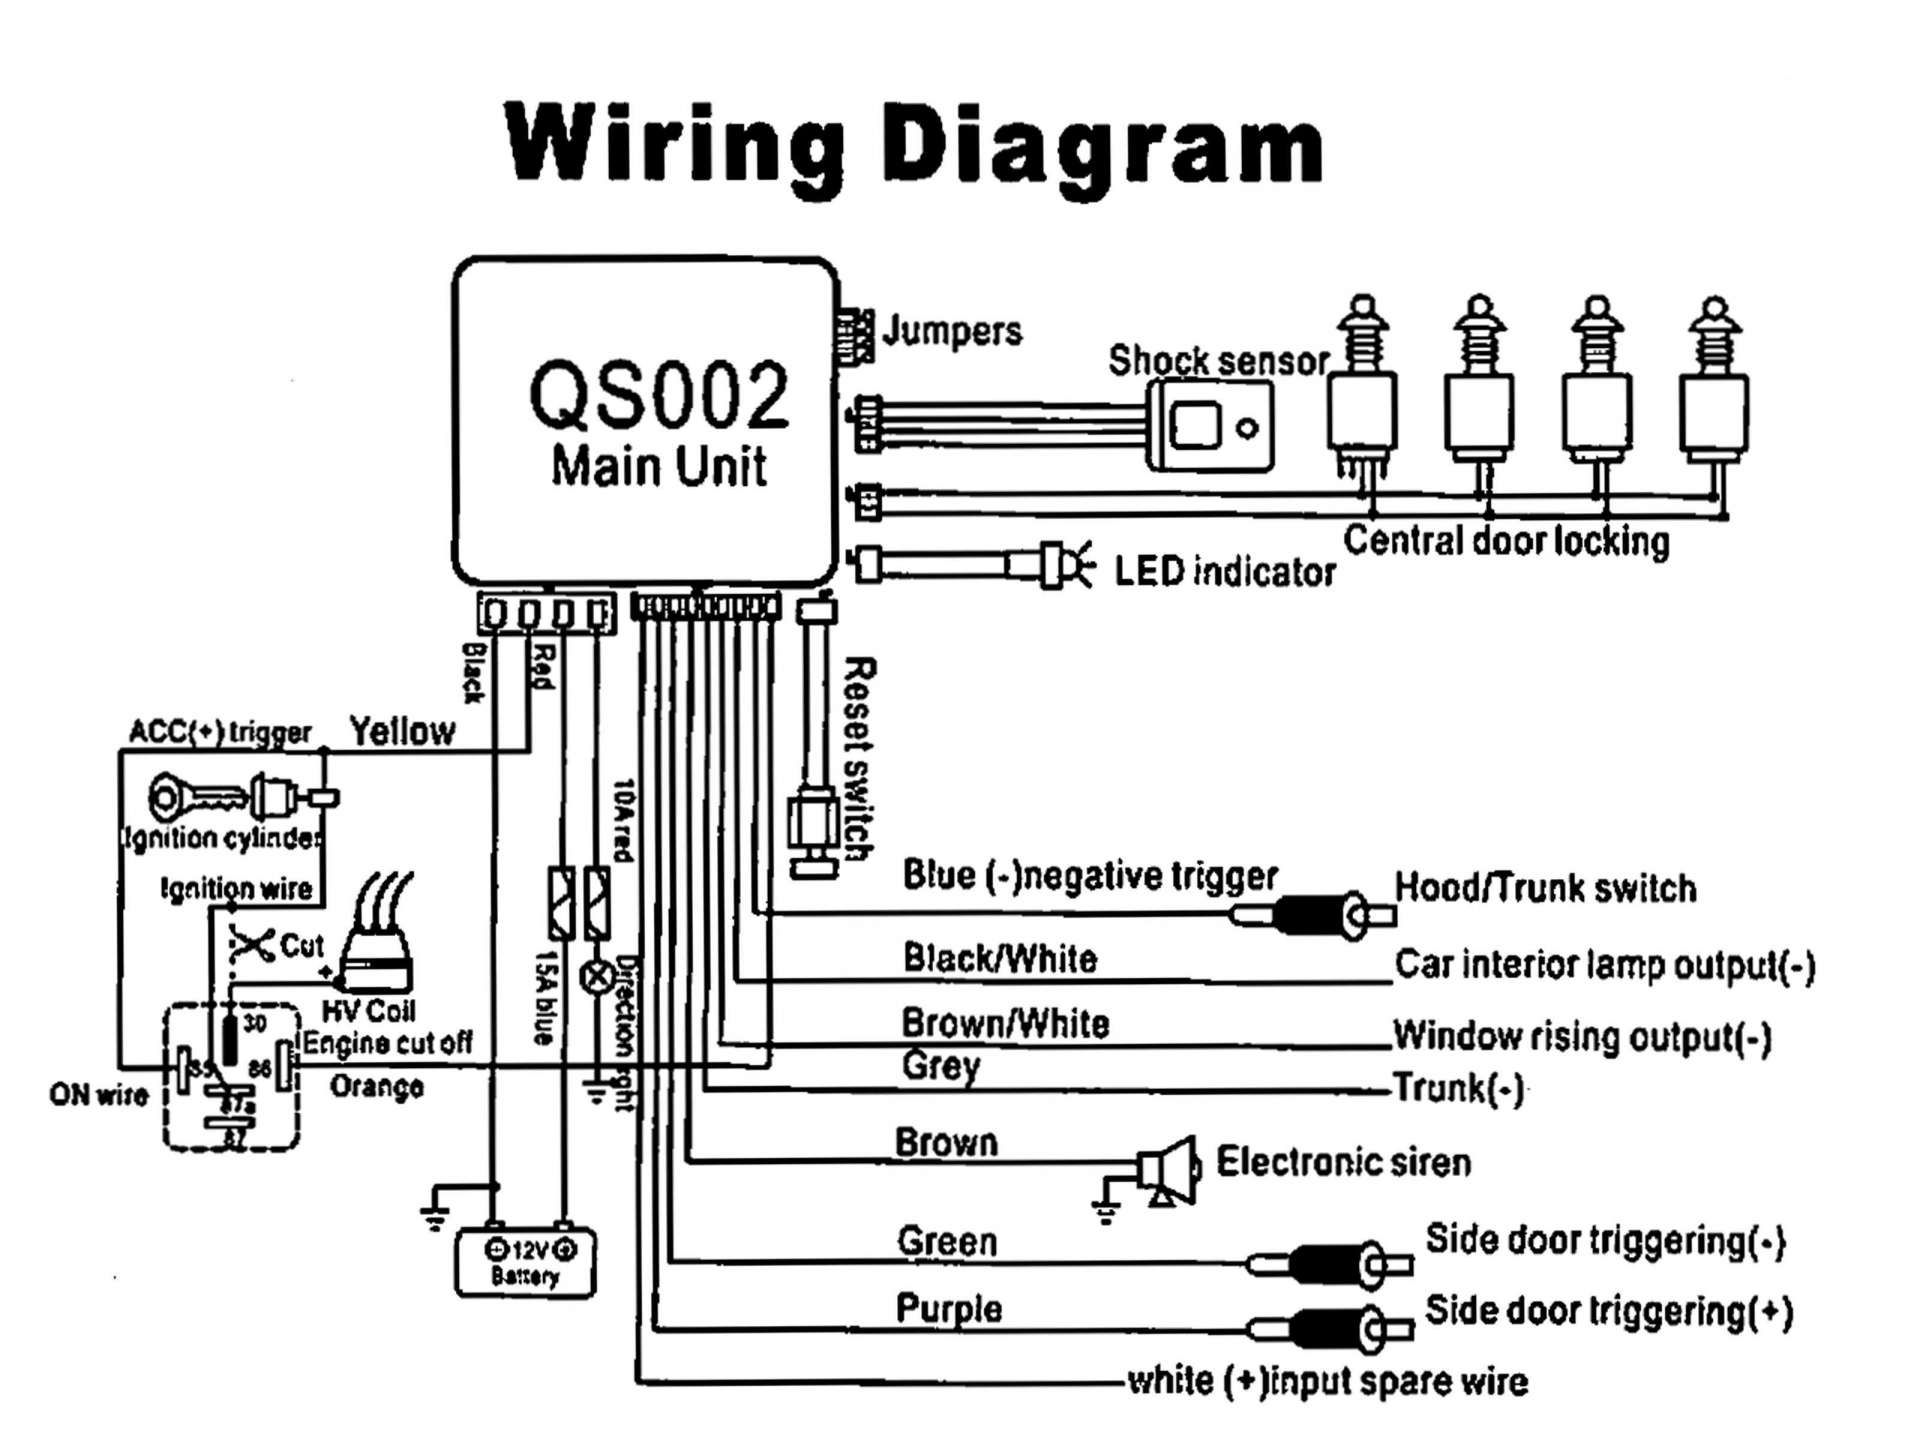 17 Basic Car Alarm Wiring Diagram Car Alarm Diagram Electrical Circuit Diagram